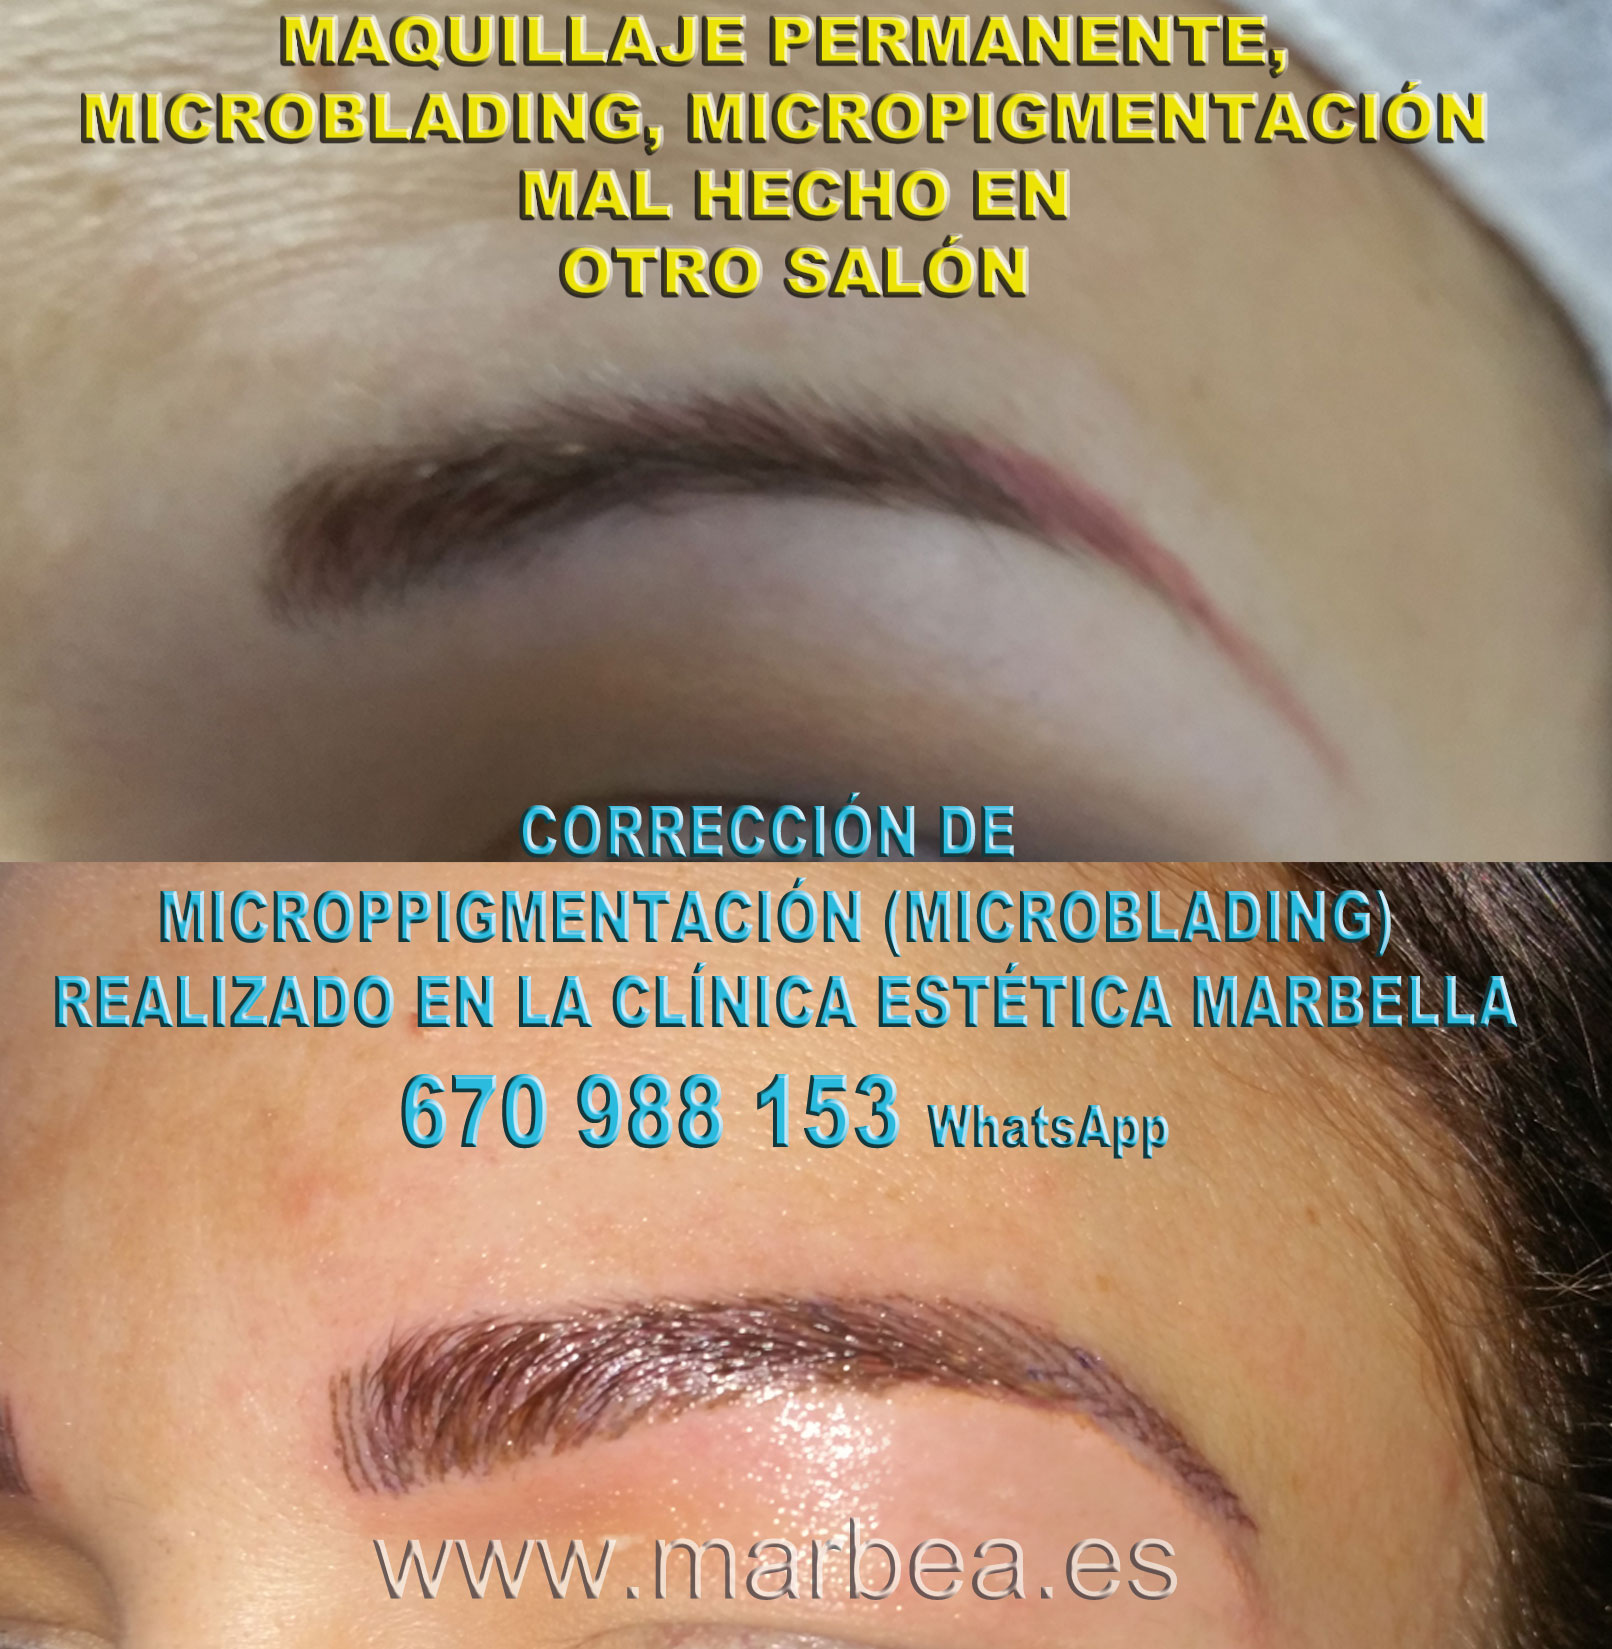 Borrar maquillaje permanente mal hecha clínica estética maquillaje permanete propone micropigmentacion correctiva de cejas,micropigmentación correctiva cejas mal hecha